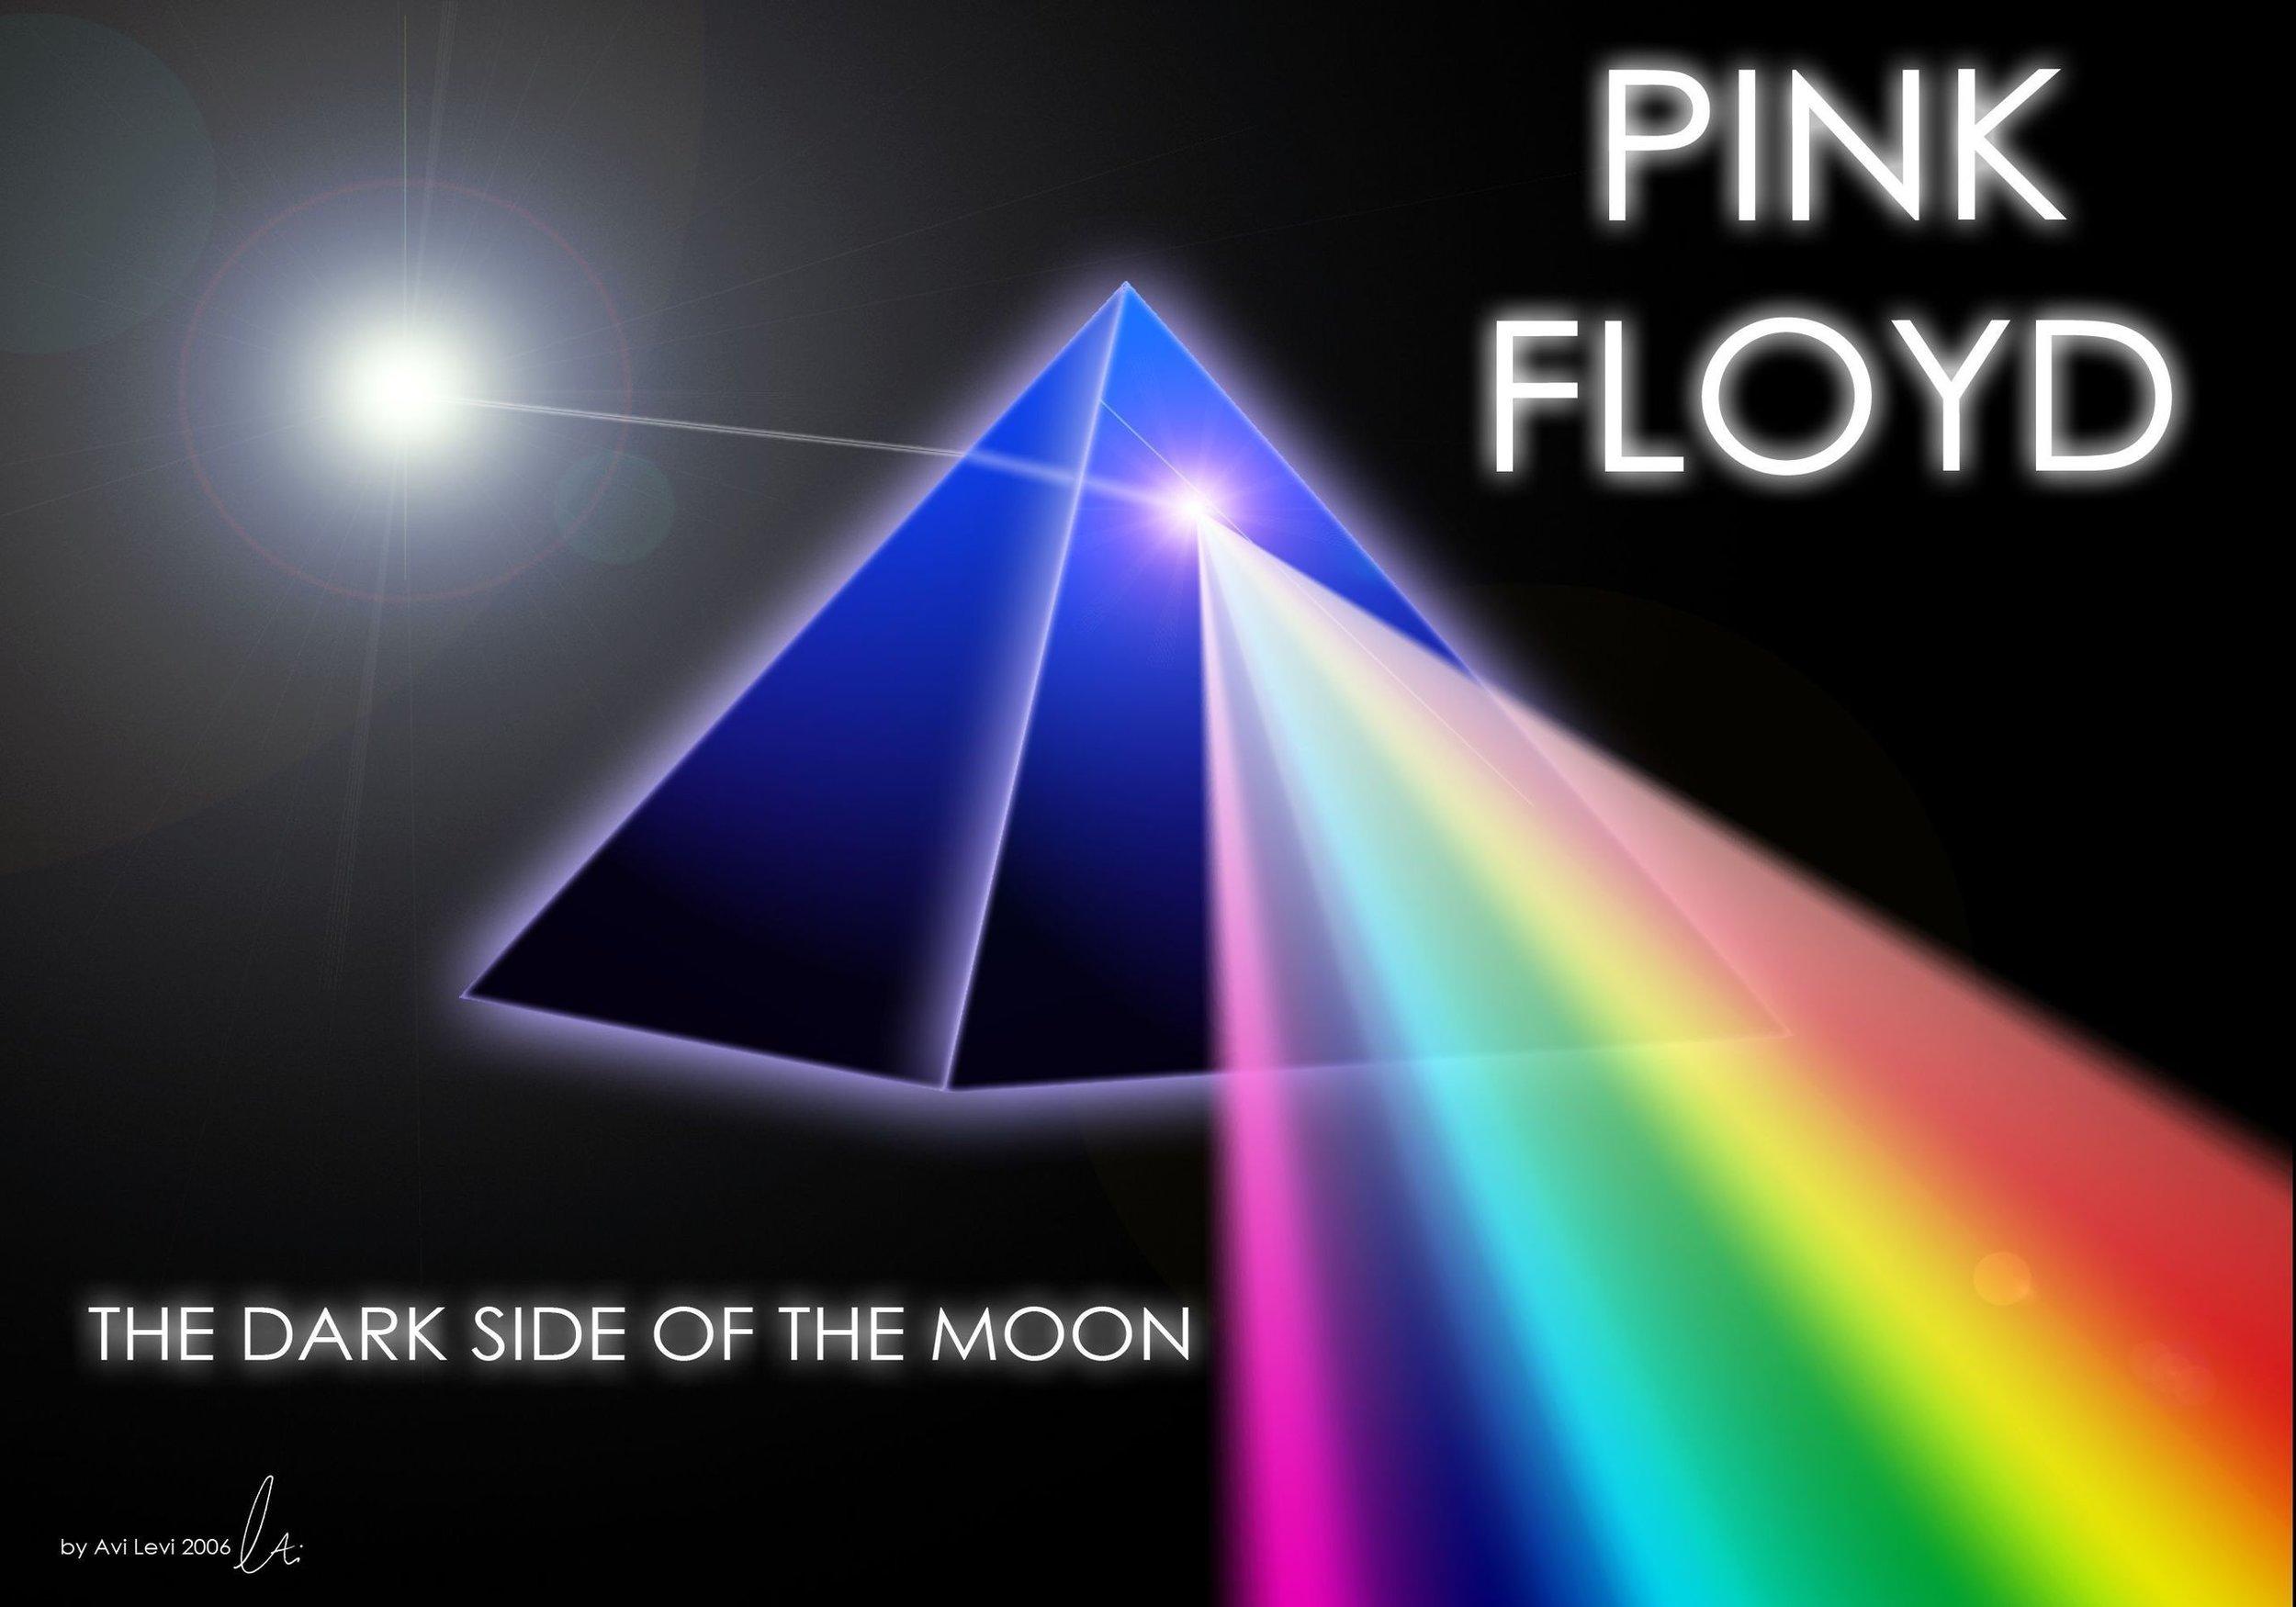 1PINK FLOYD.jpg